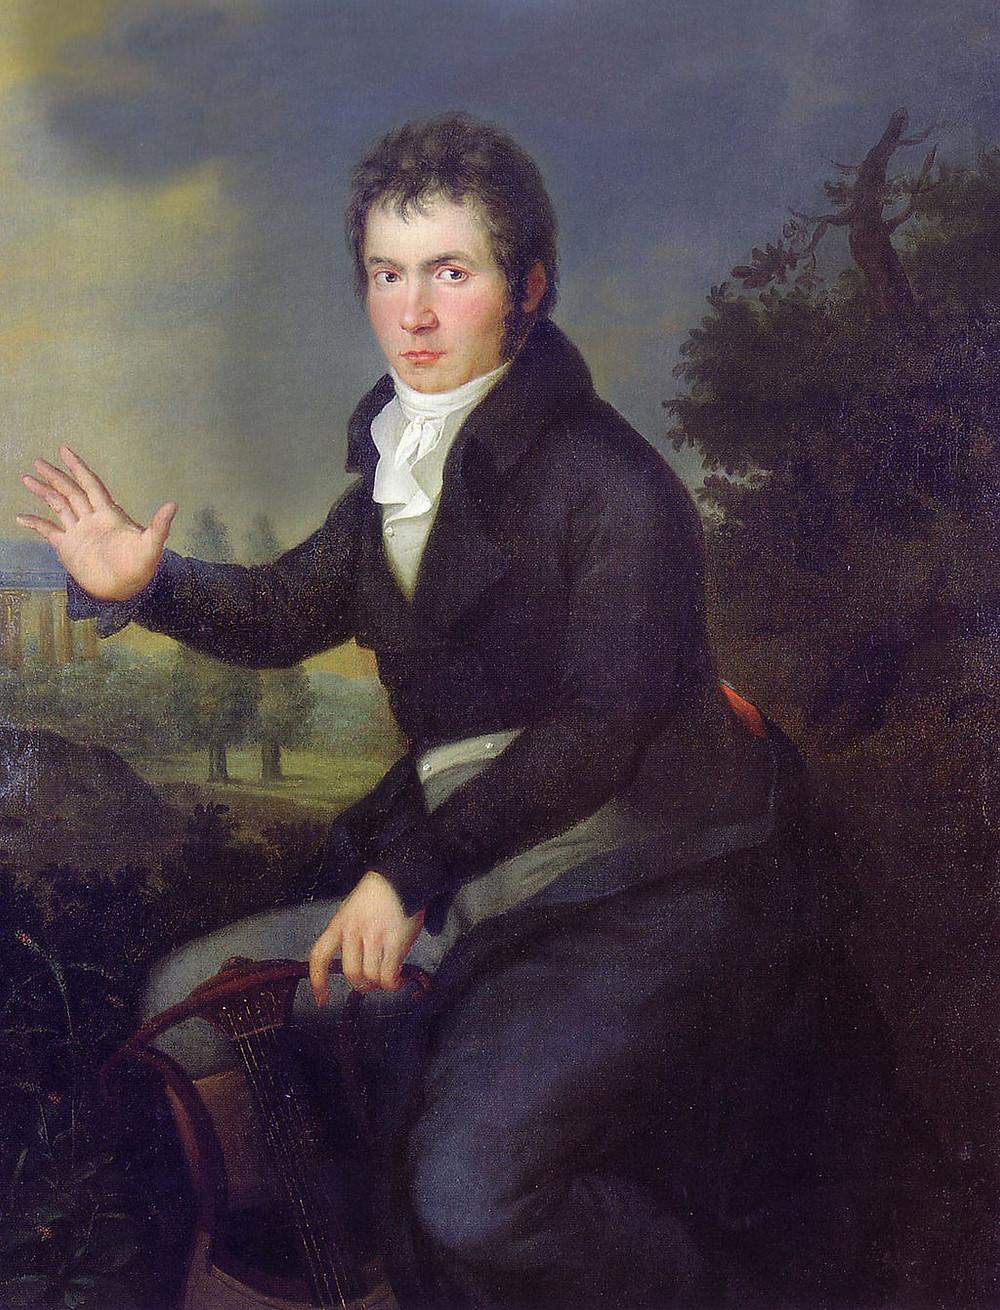 Joseph Willibrord Mähler's Beethoven Portrait 1804/05